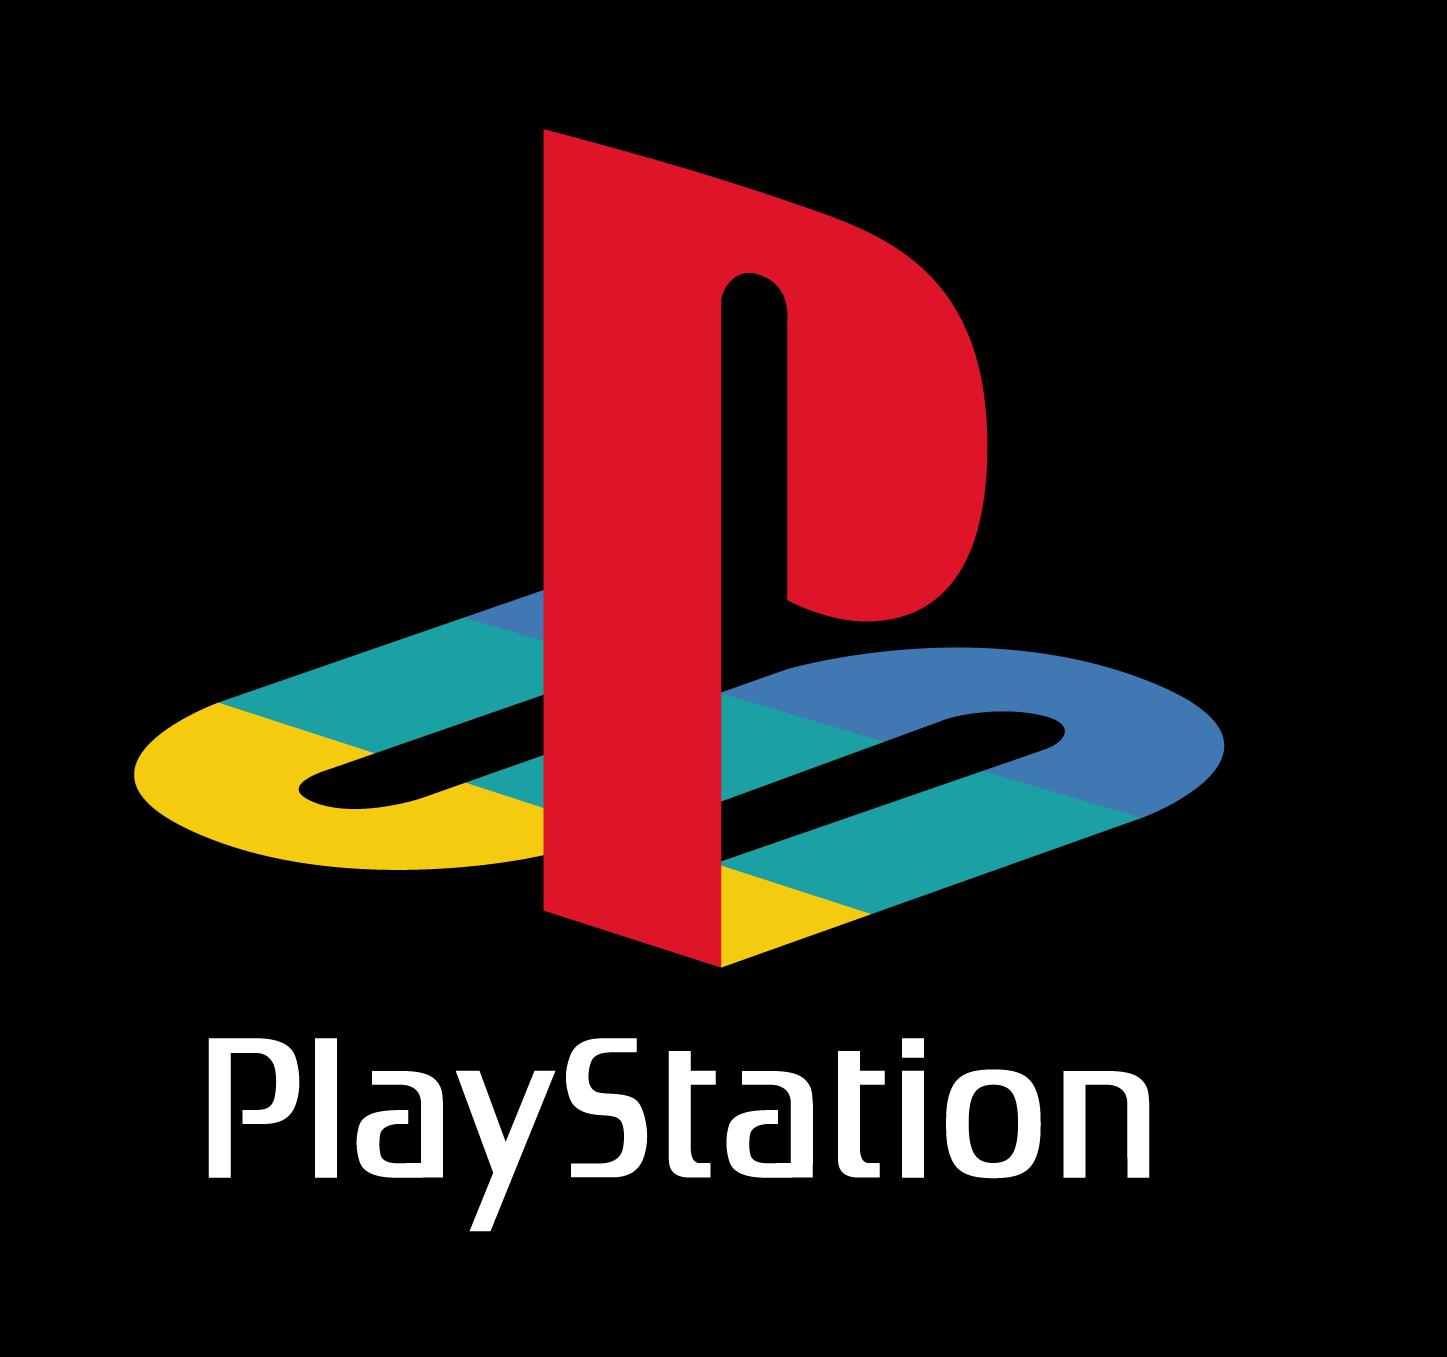 PlayStation console Logo Google And Logos